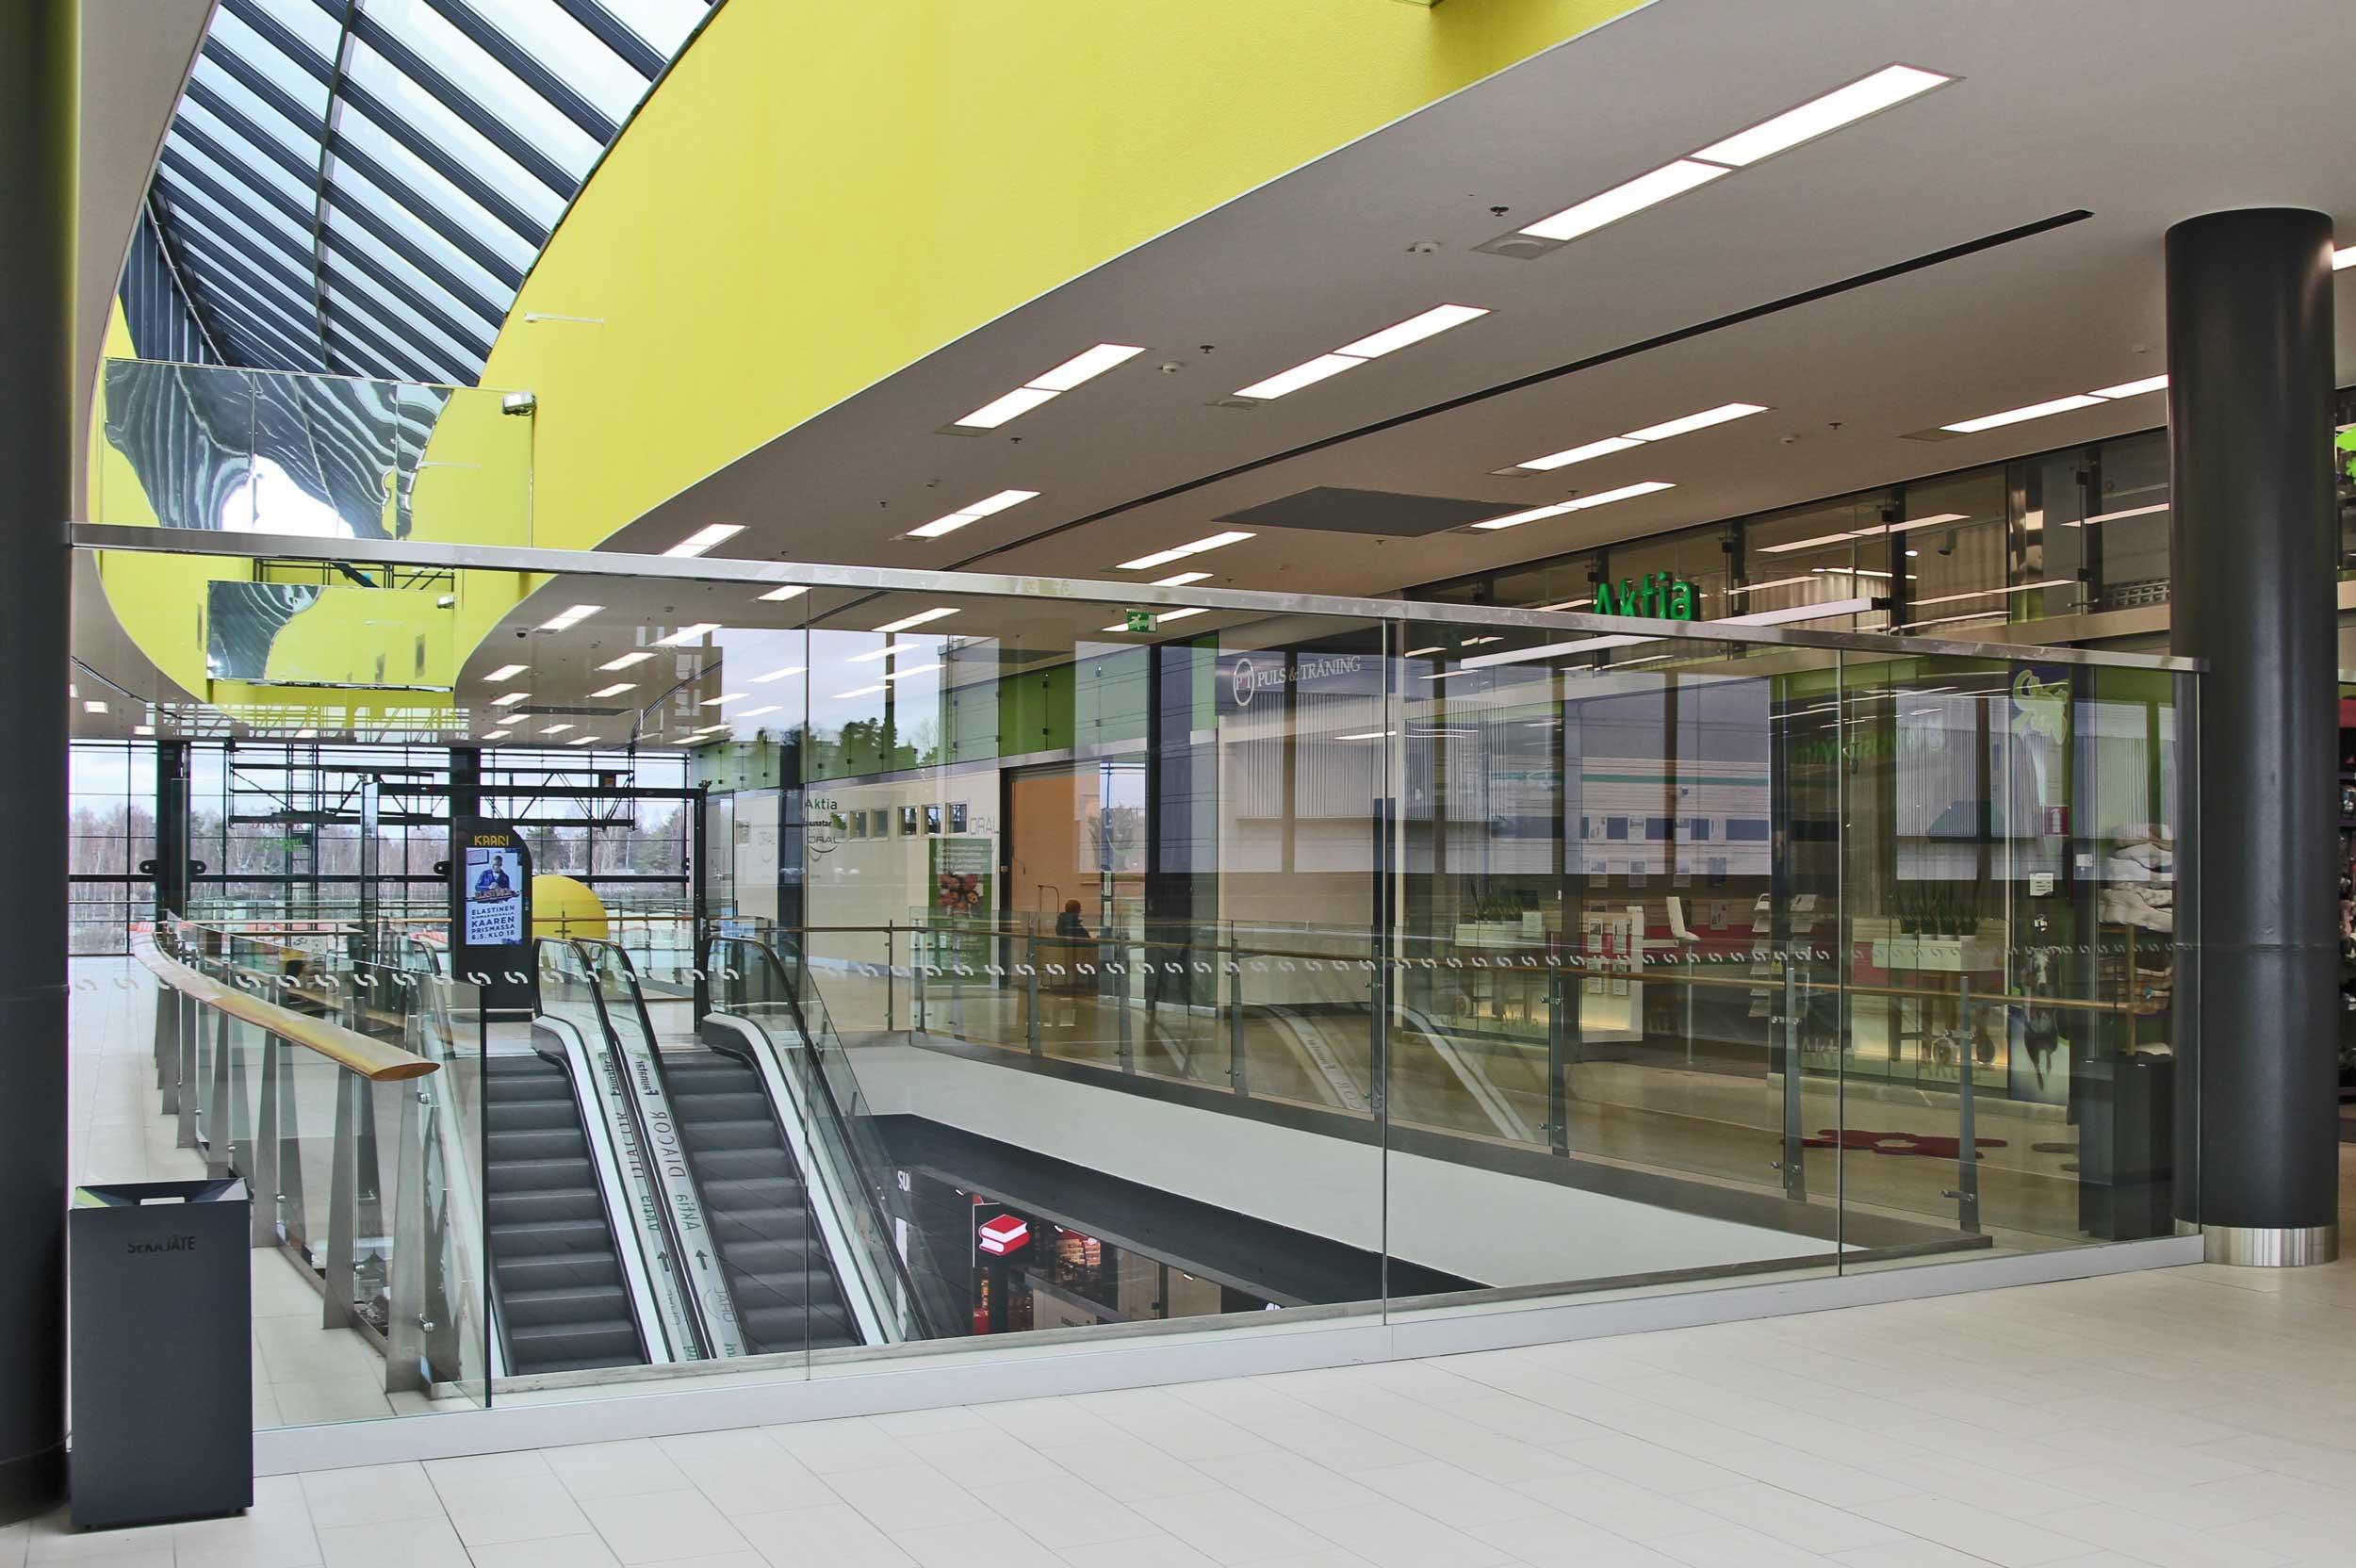 Scanmikael_Shopping centre concept_Kaari_Glass balustrades_Helsinki